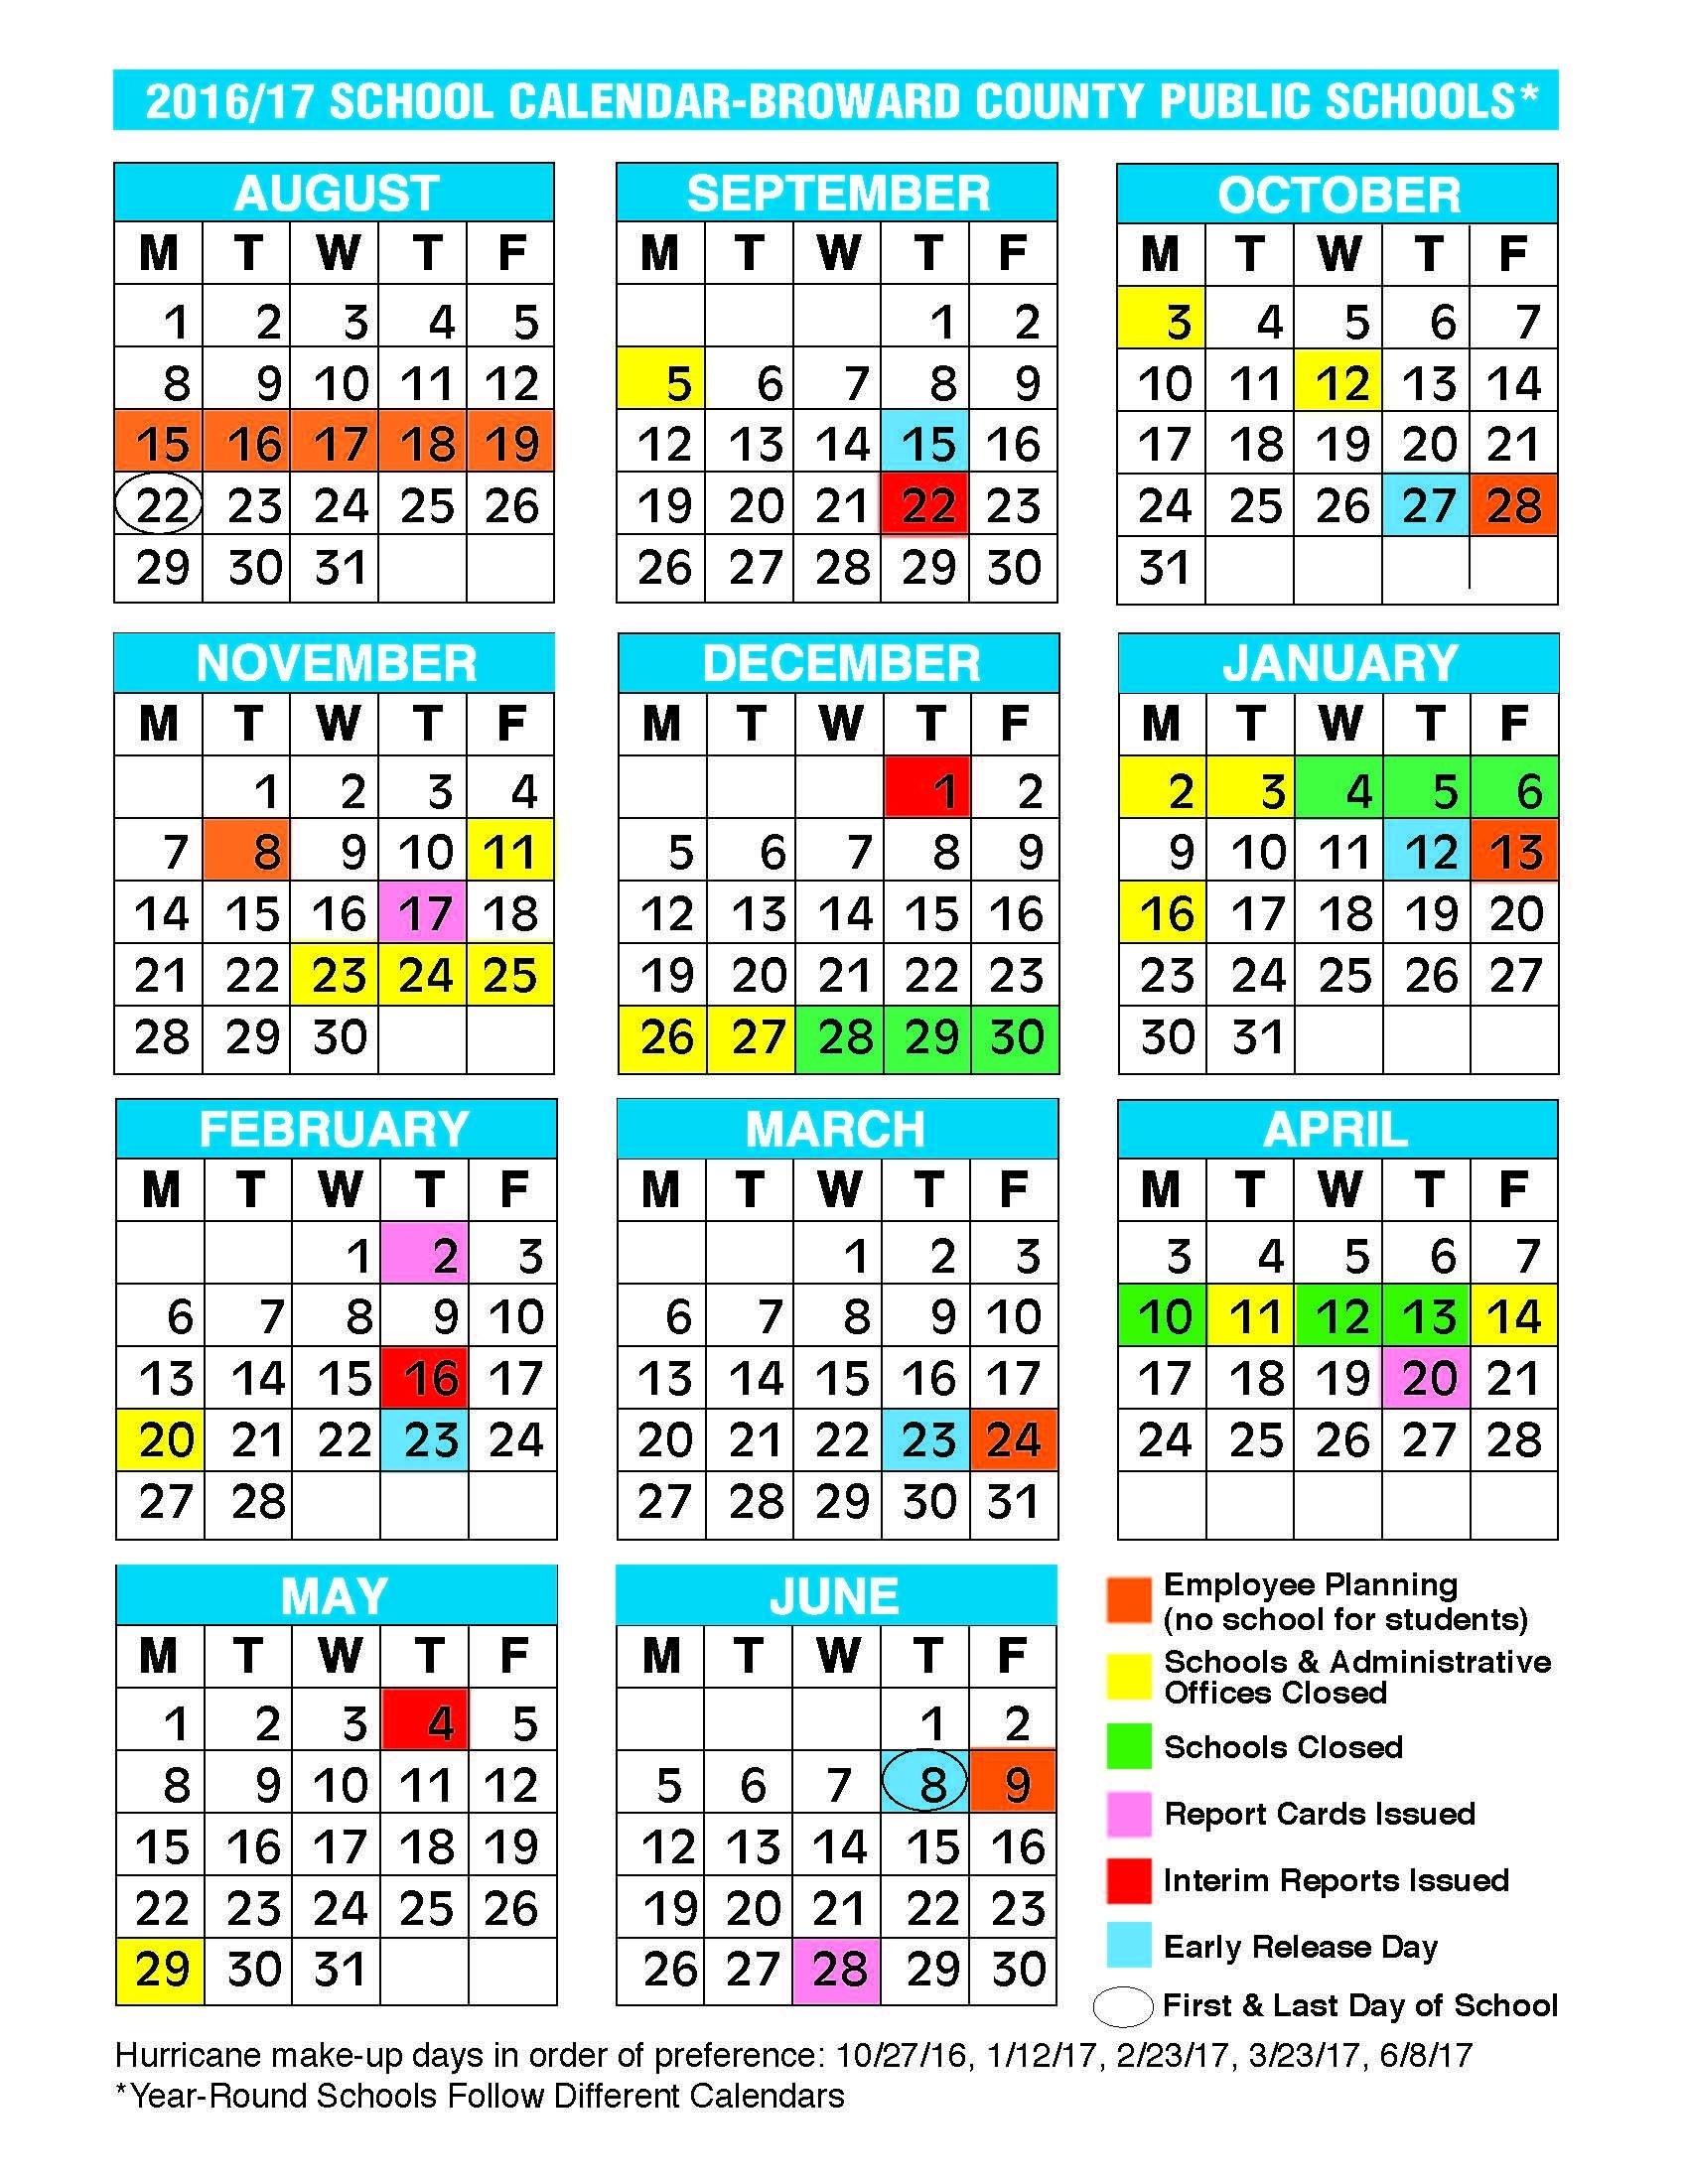 2017 2018 School Calendar Broward 2017 2016 School Calendar Broward_Calendar School 2020 Broward